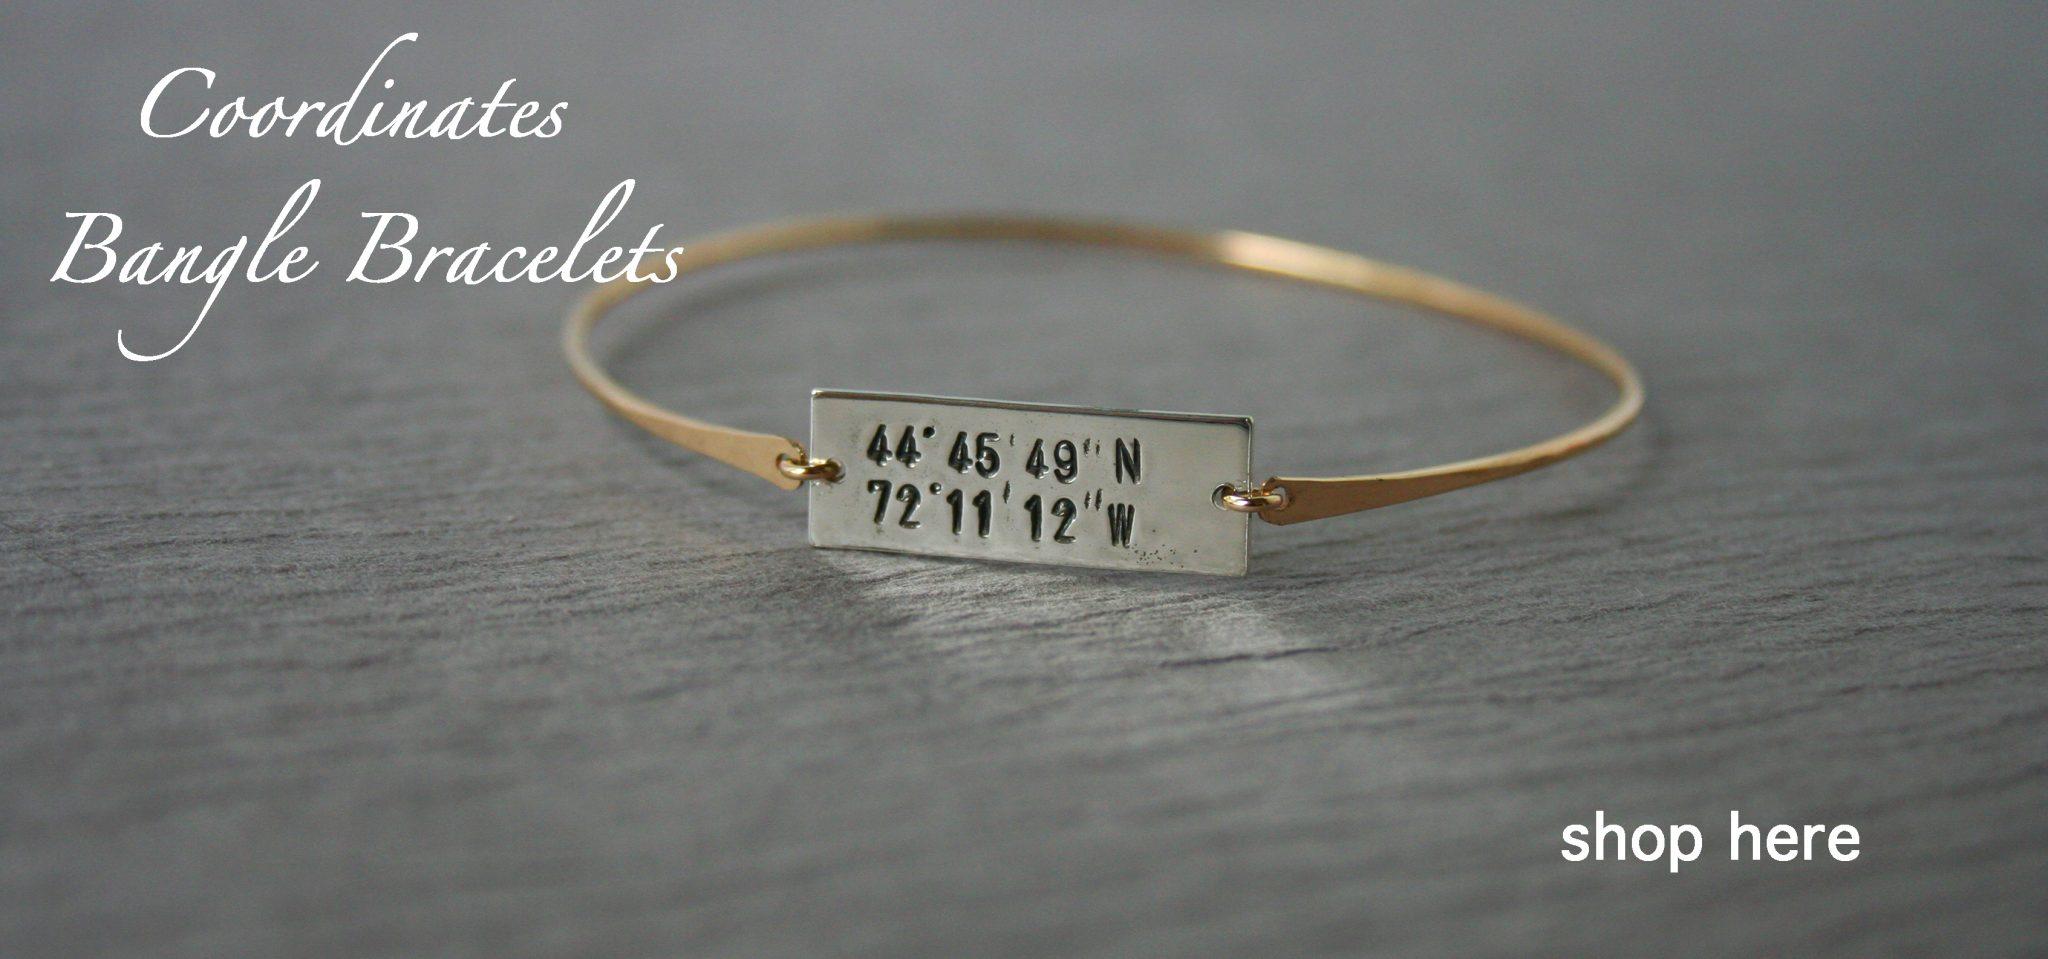 coordinates bracelet_edited-2